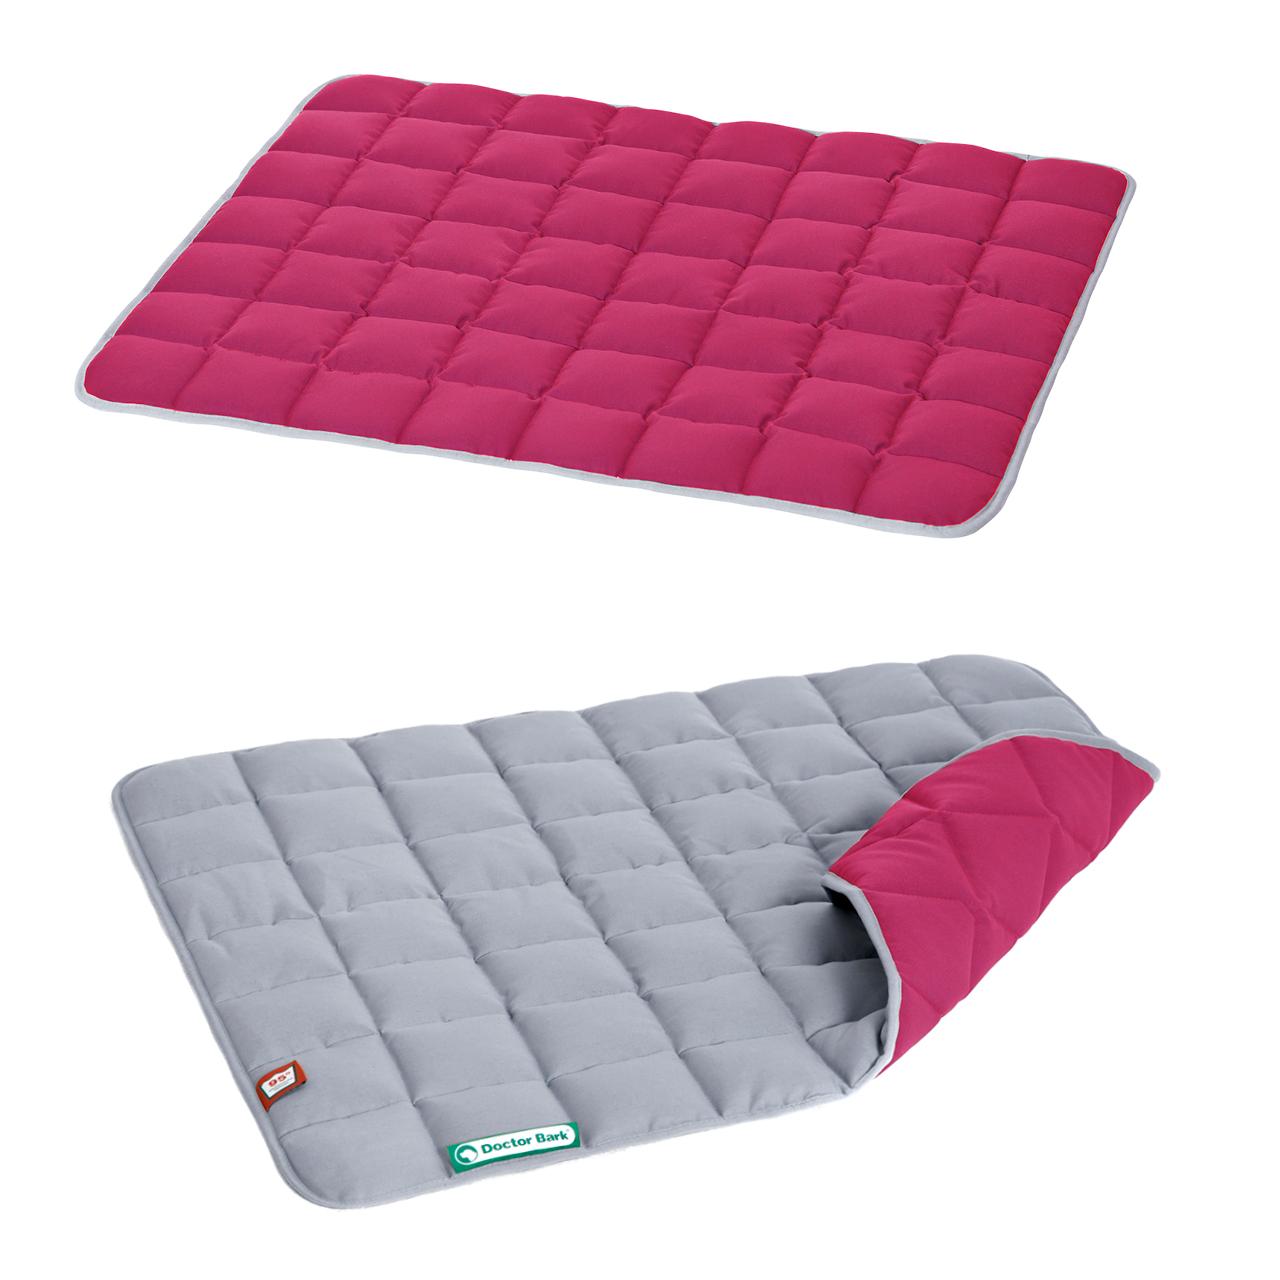 Wendesteppdecke platingrau - hot pink M